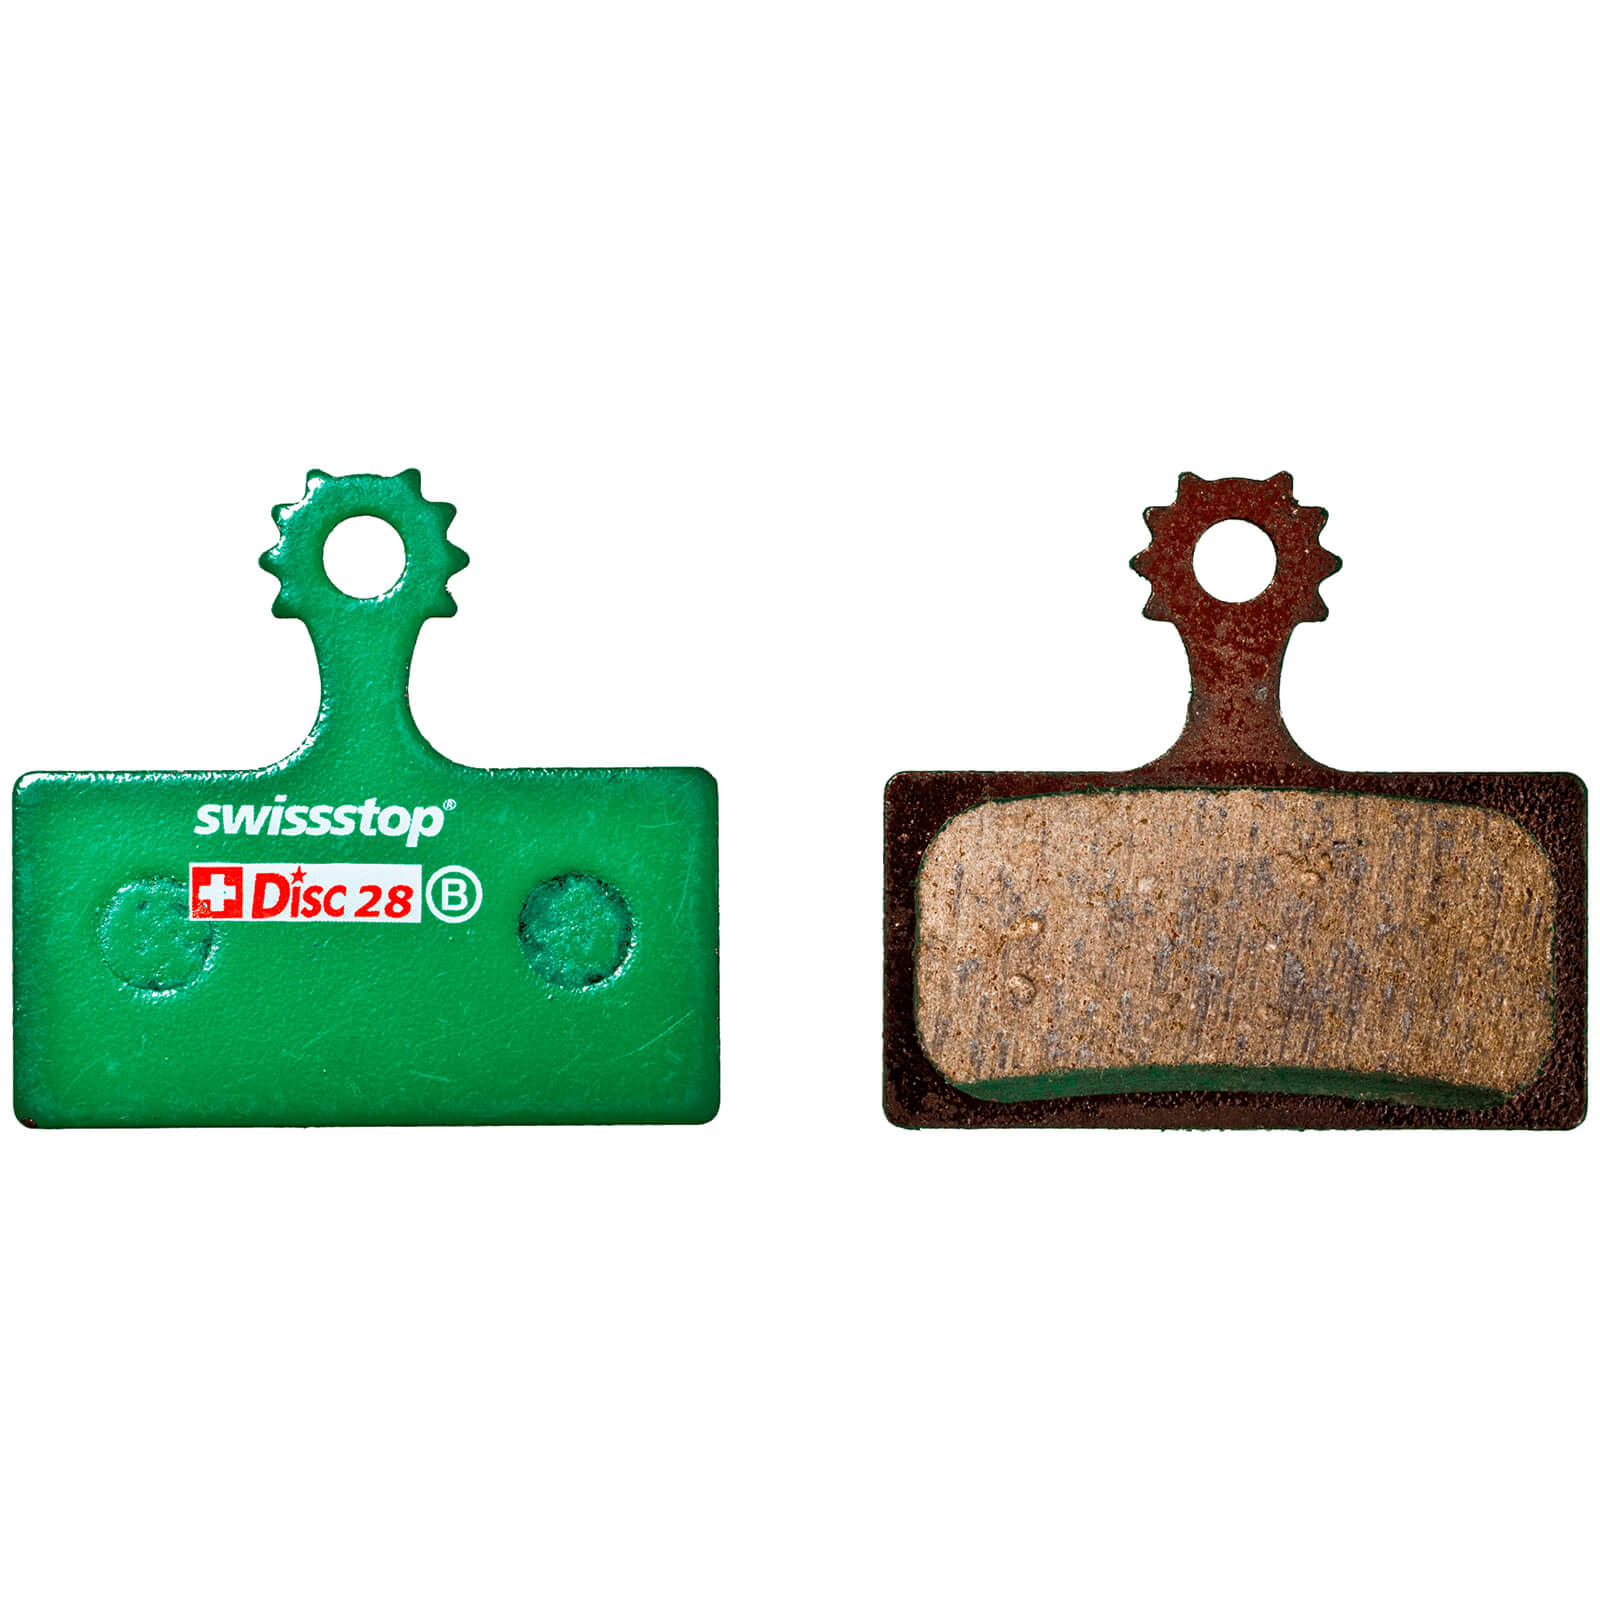 Swissstop Organic Disc Brake Pads - Disc 28